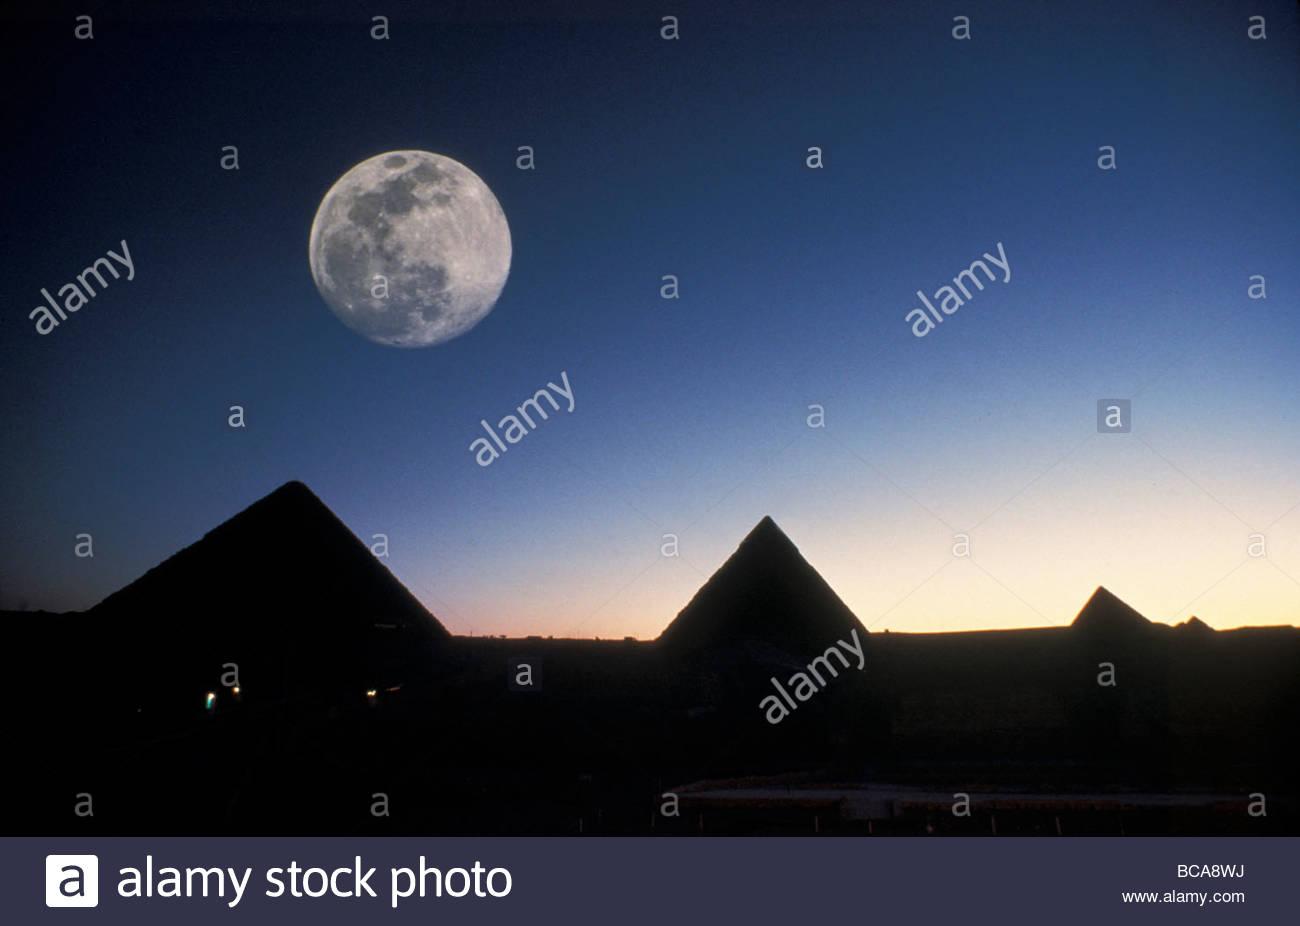 Moonrise above Giza pyramids in Egypt. - Stock Image